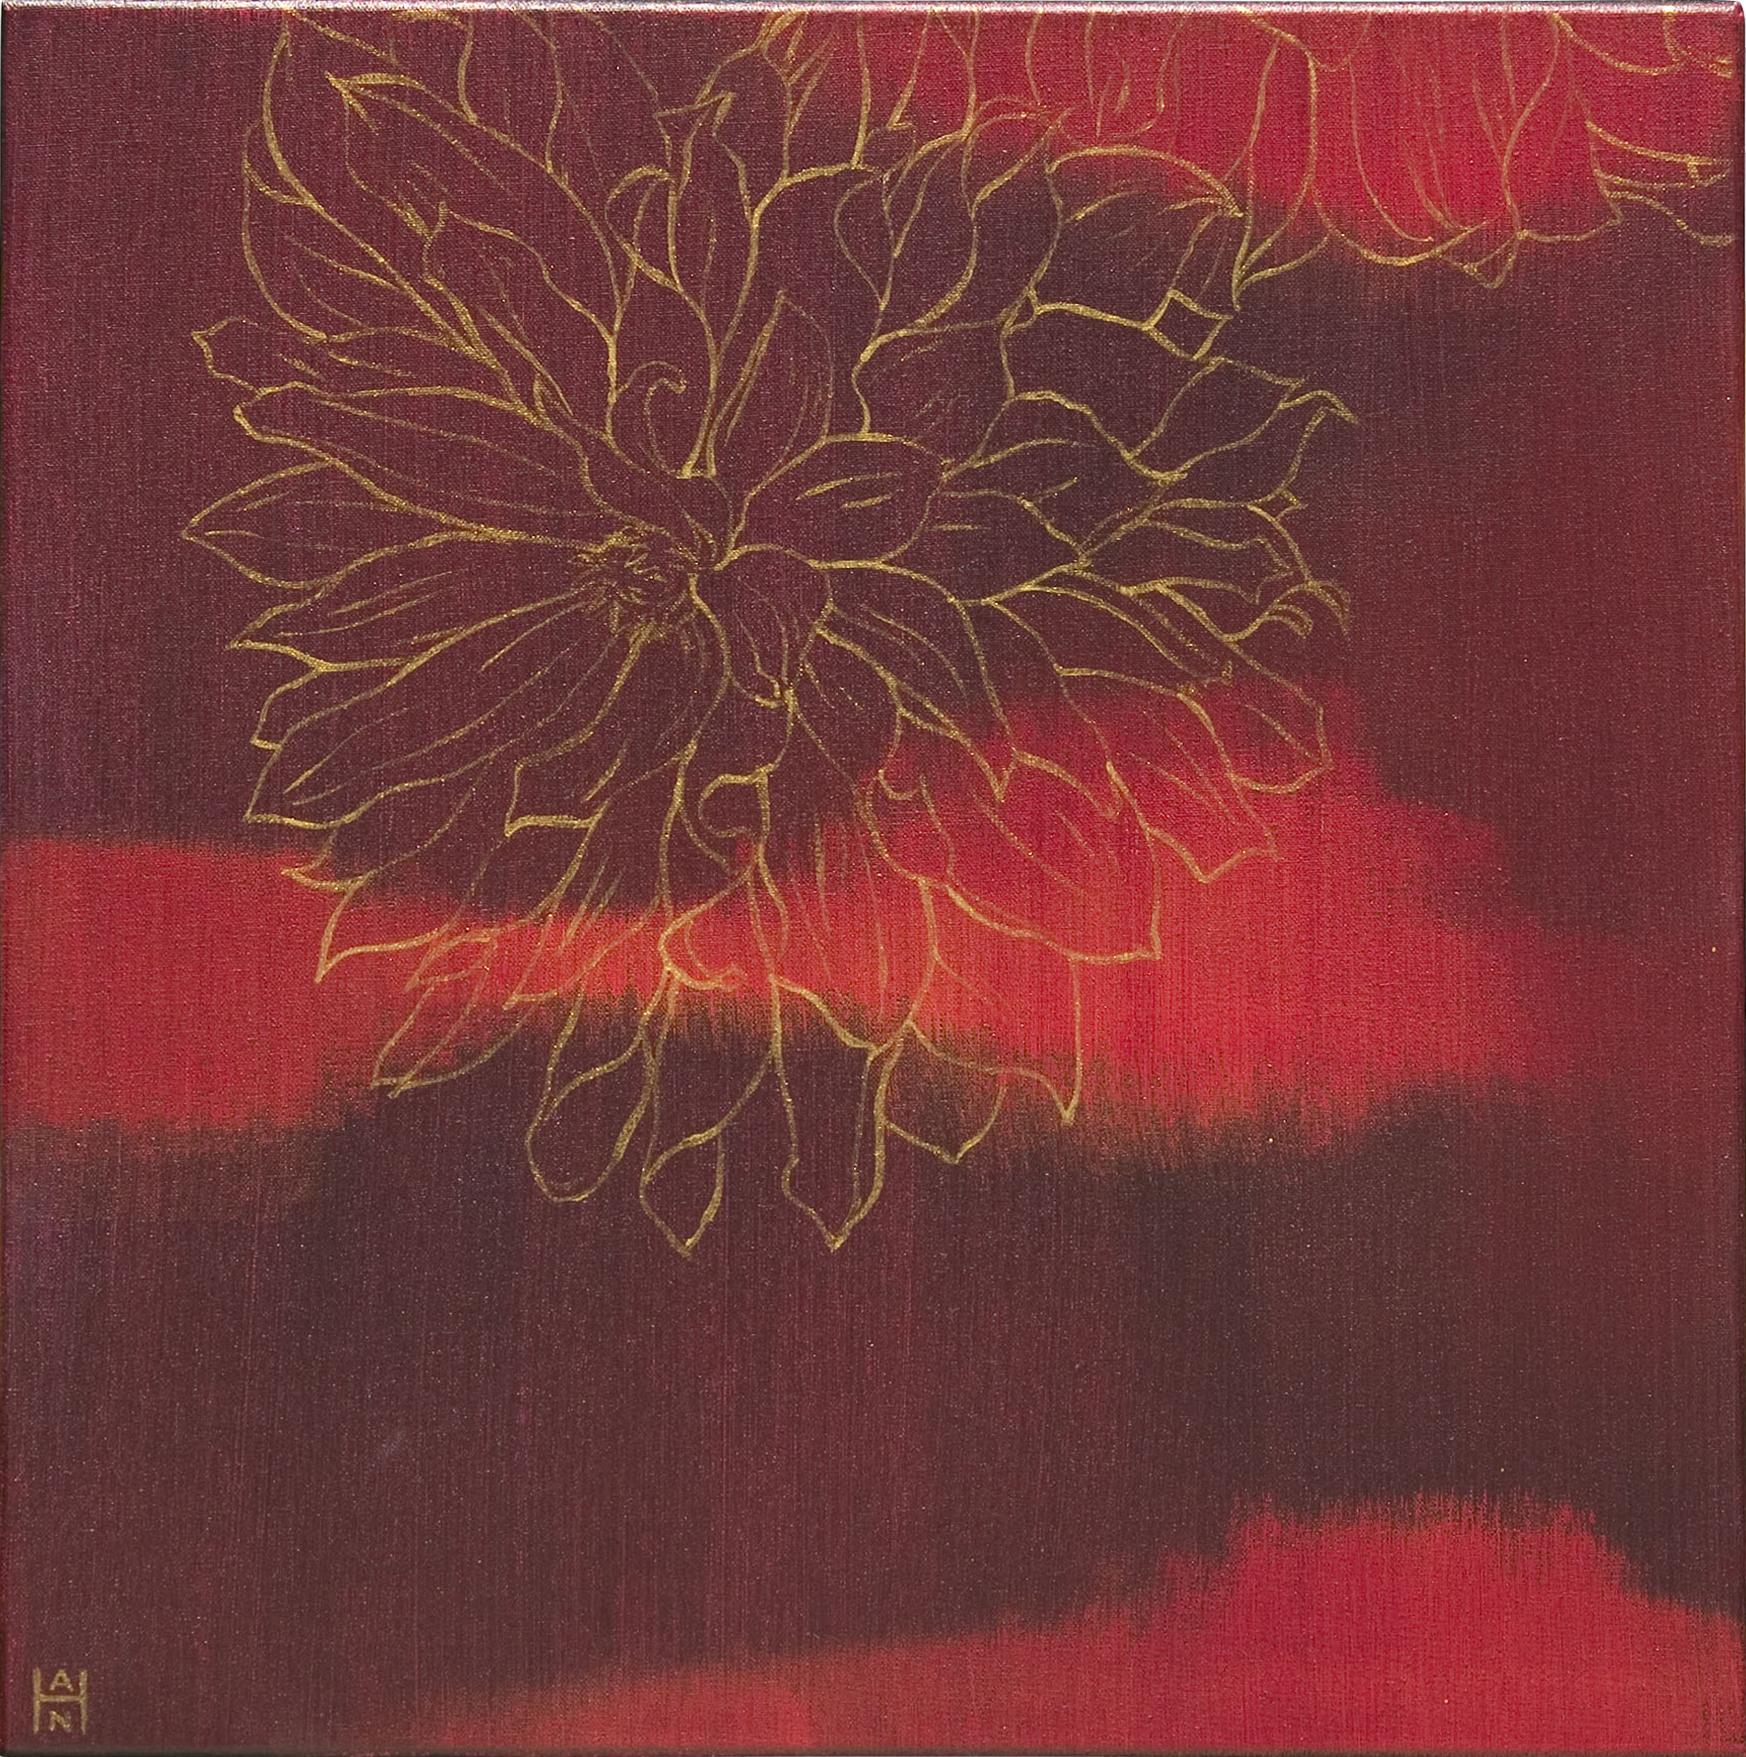 "Solaris 2, acrylic on canvas, 14"" x 14"", $350"